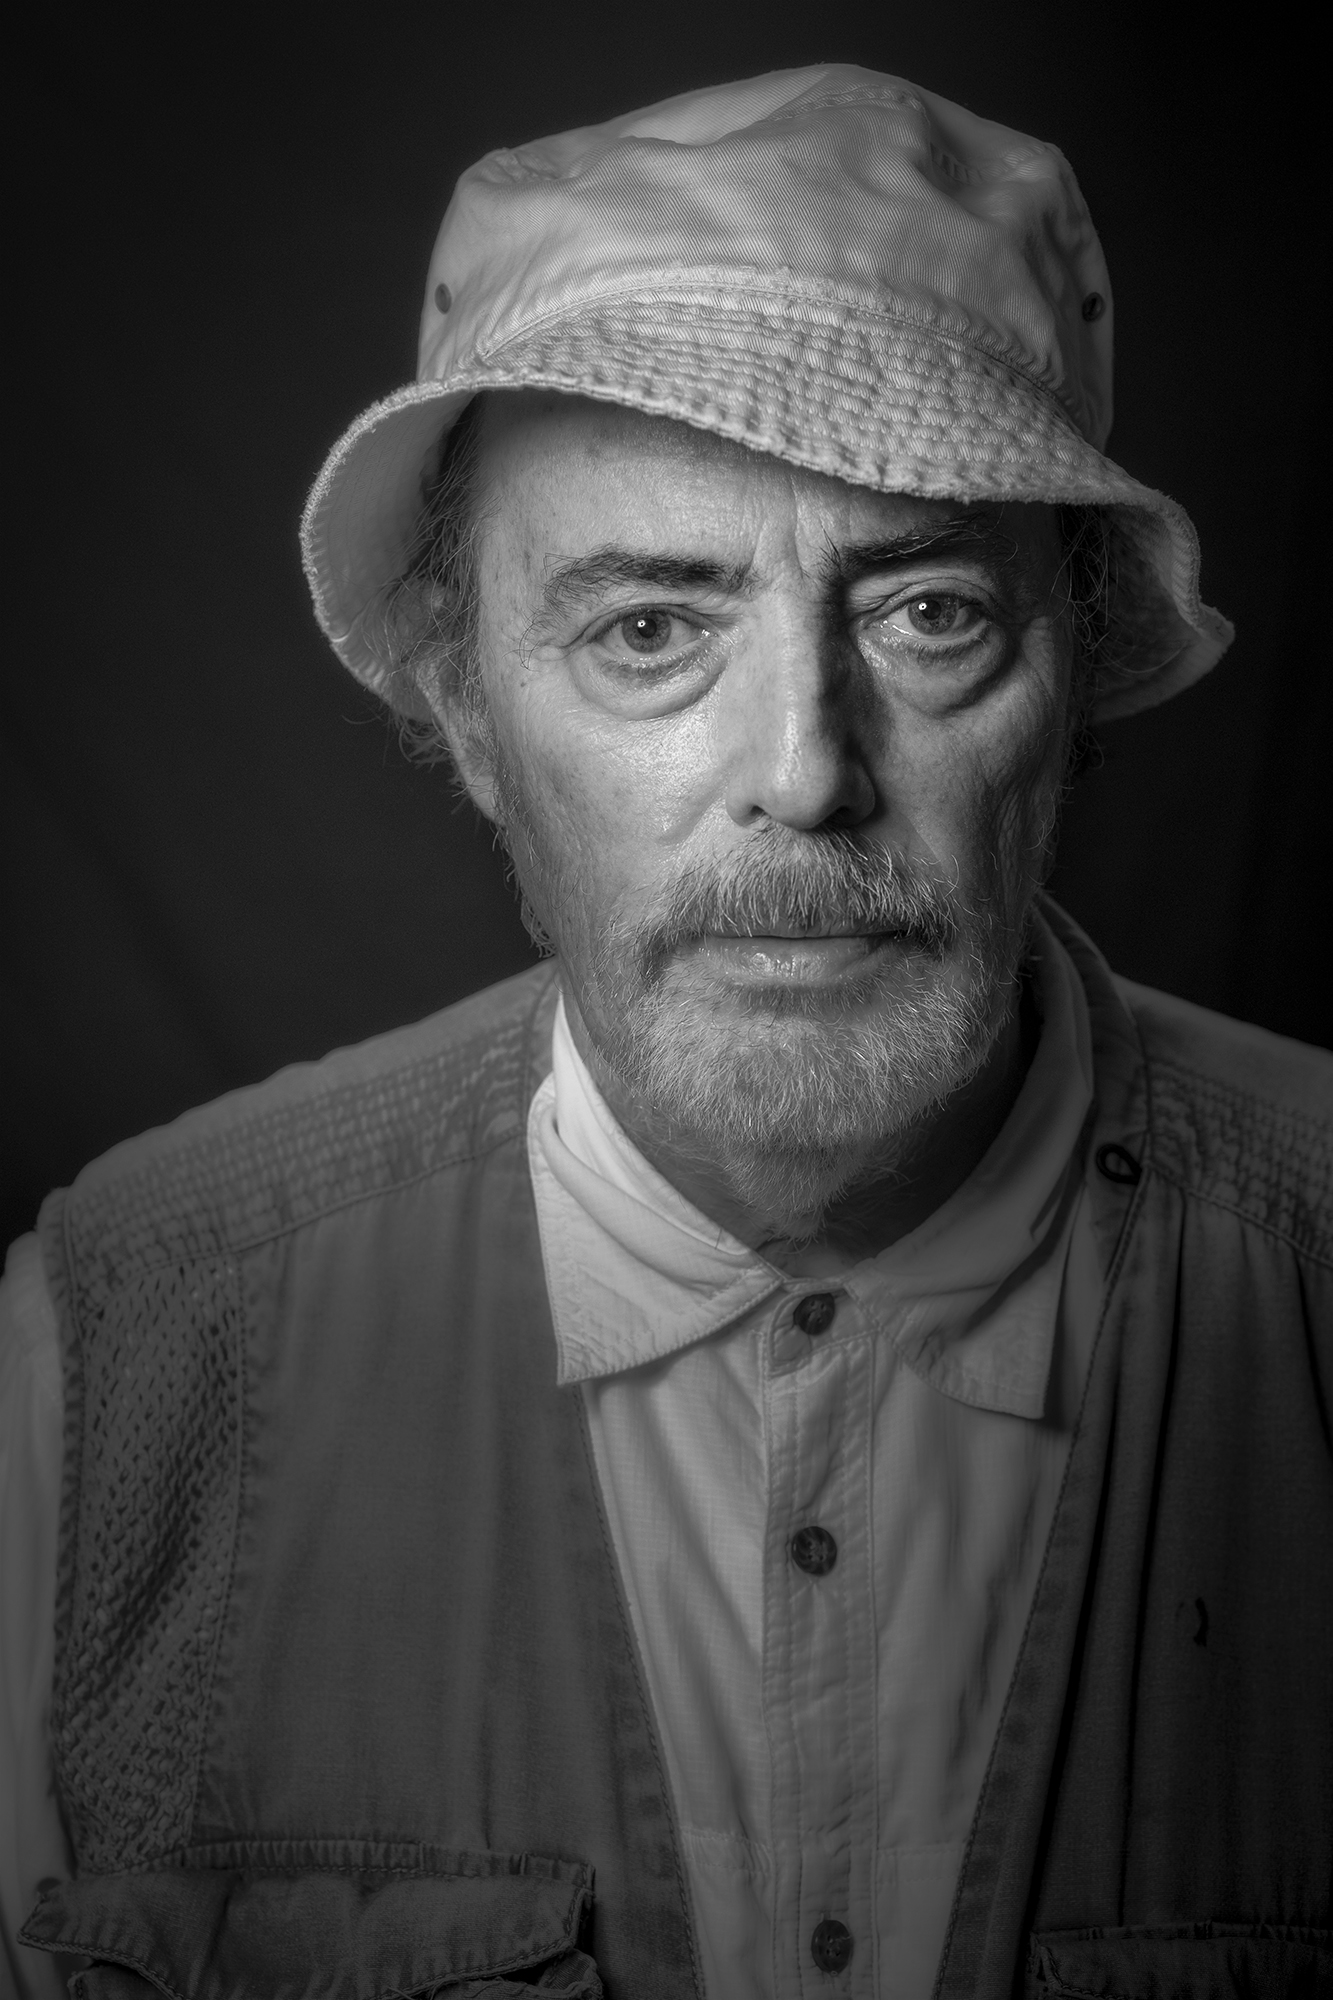 Photographer Bruce Gilden